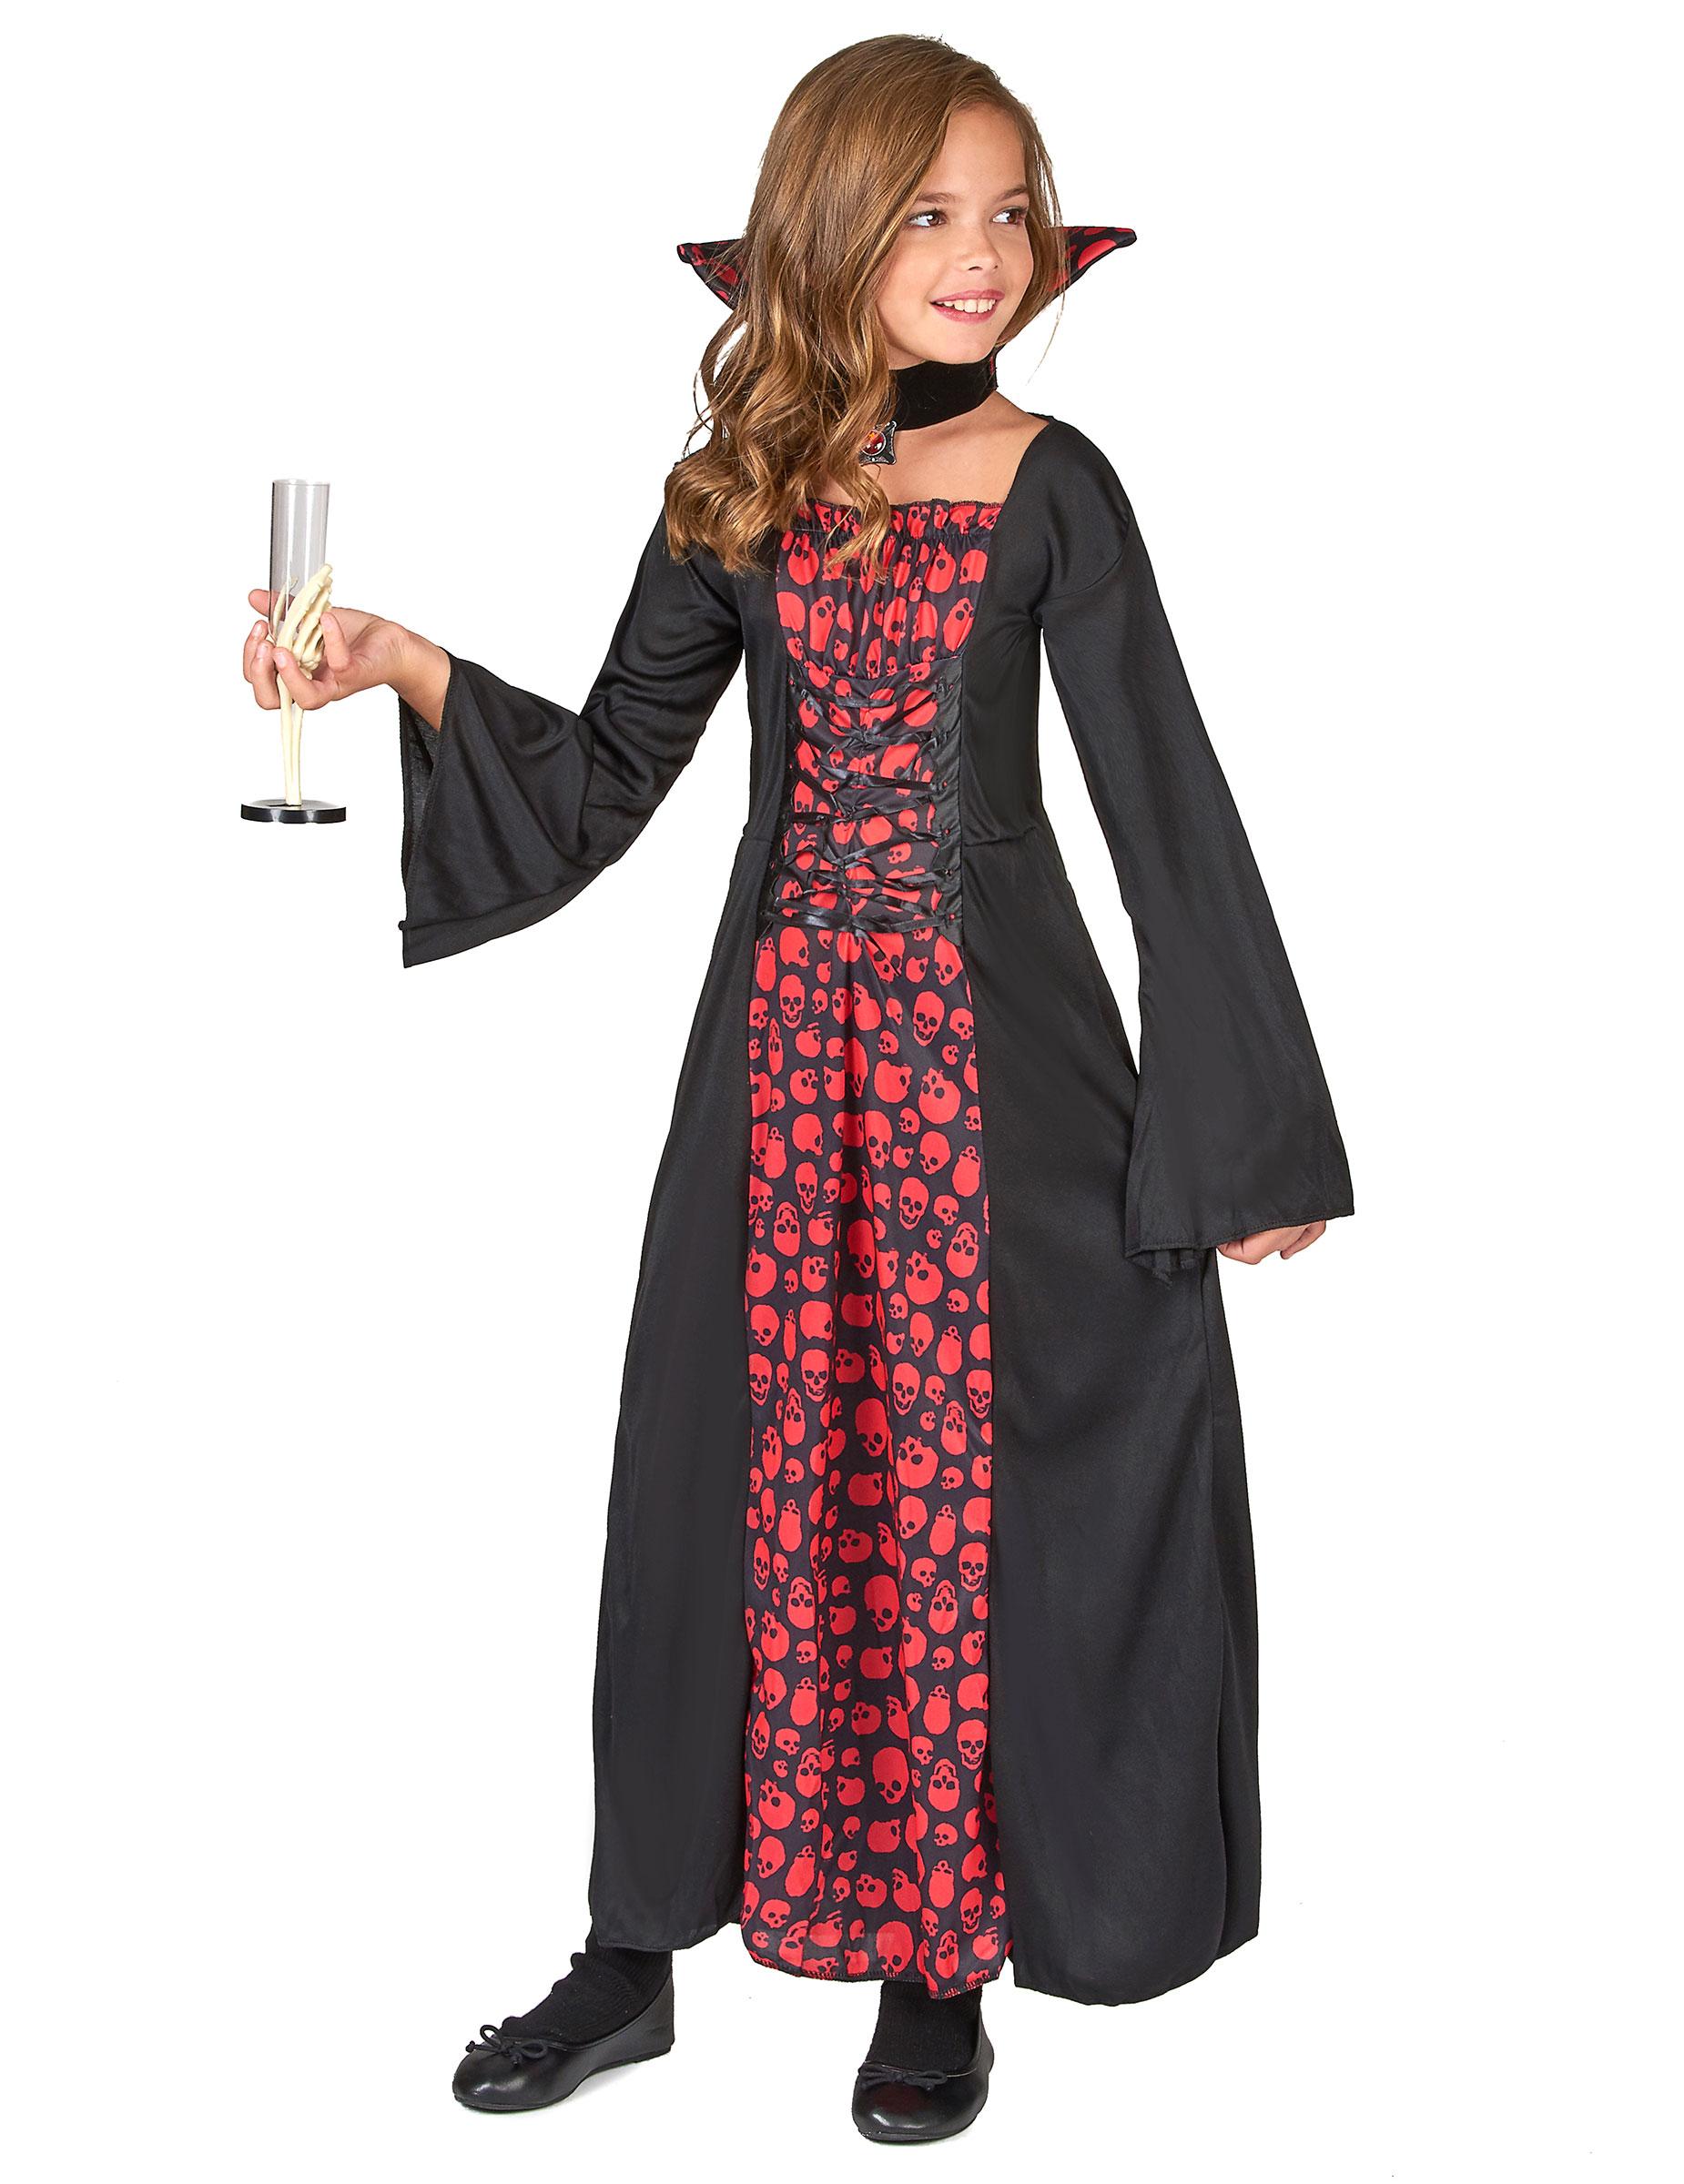 Costume vampira bambina su VegaooParty e17a69b184b6